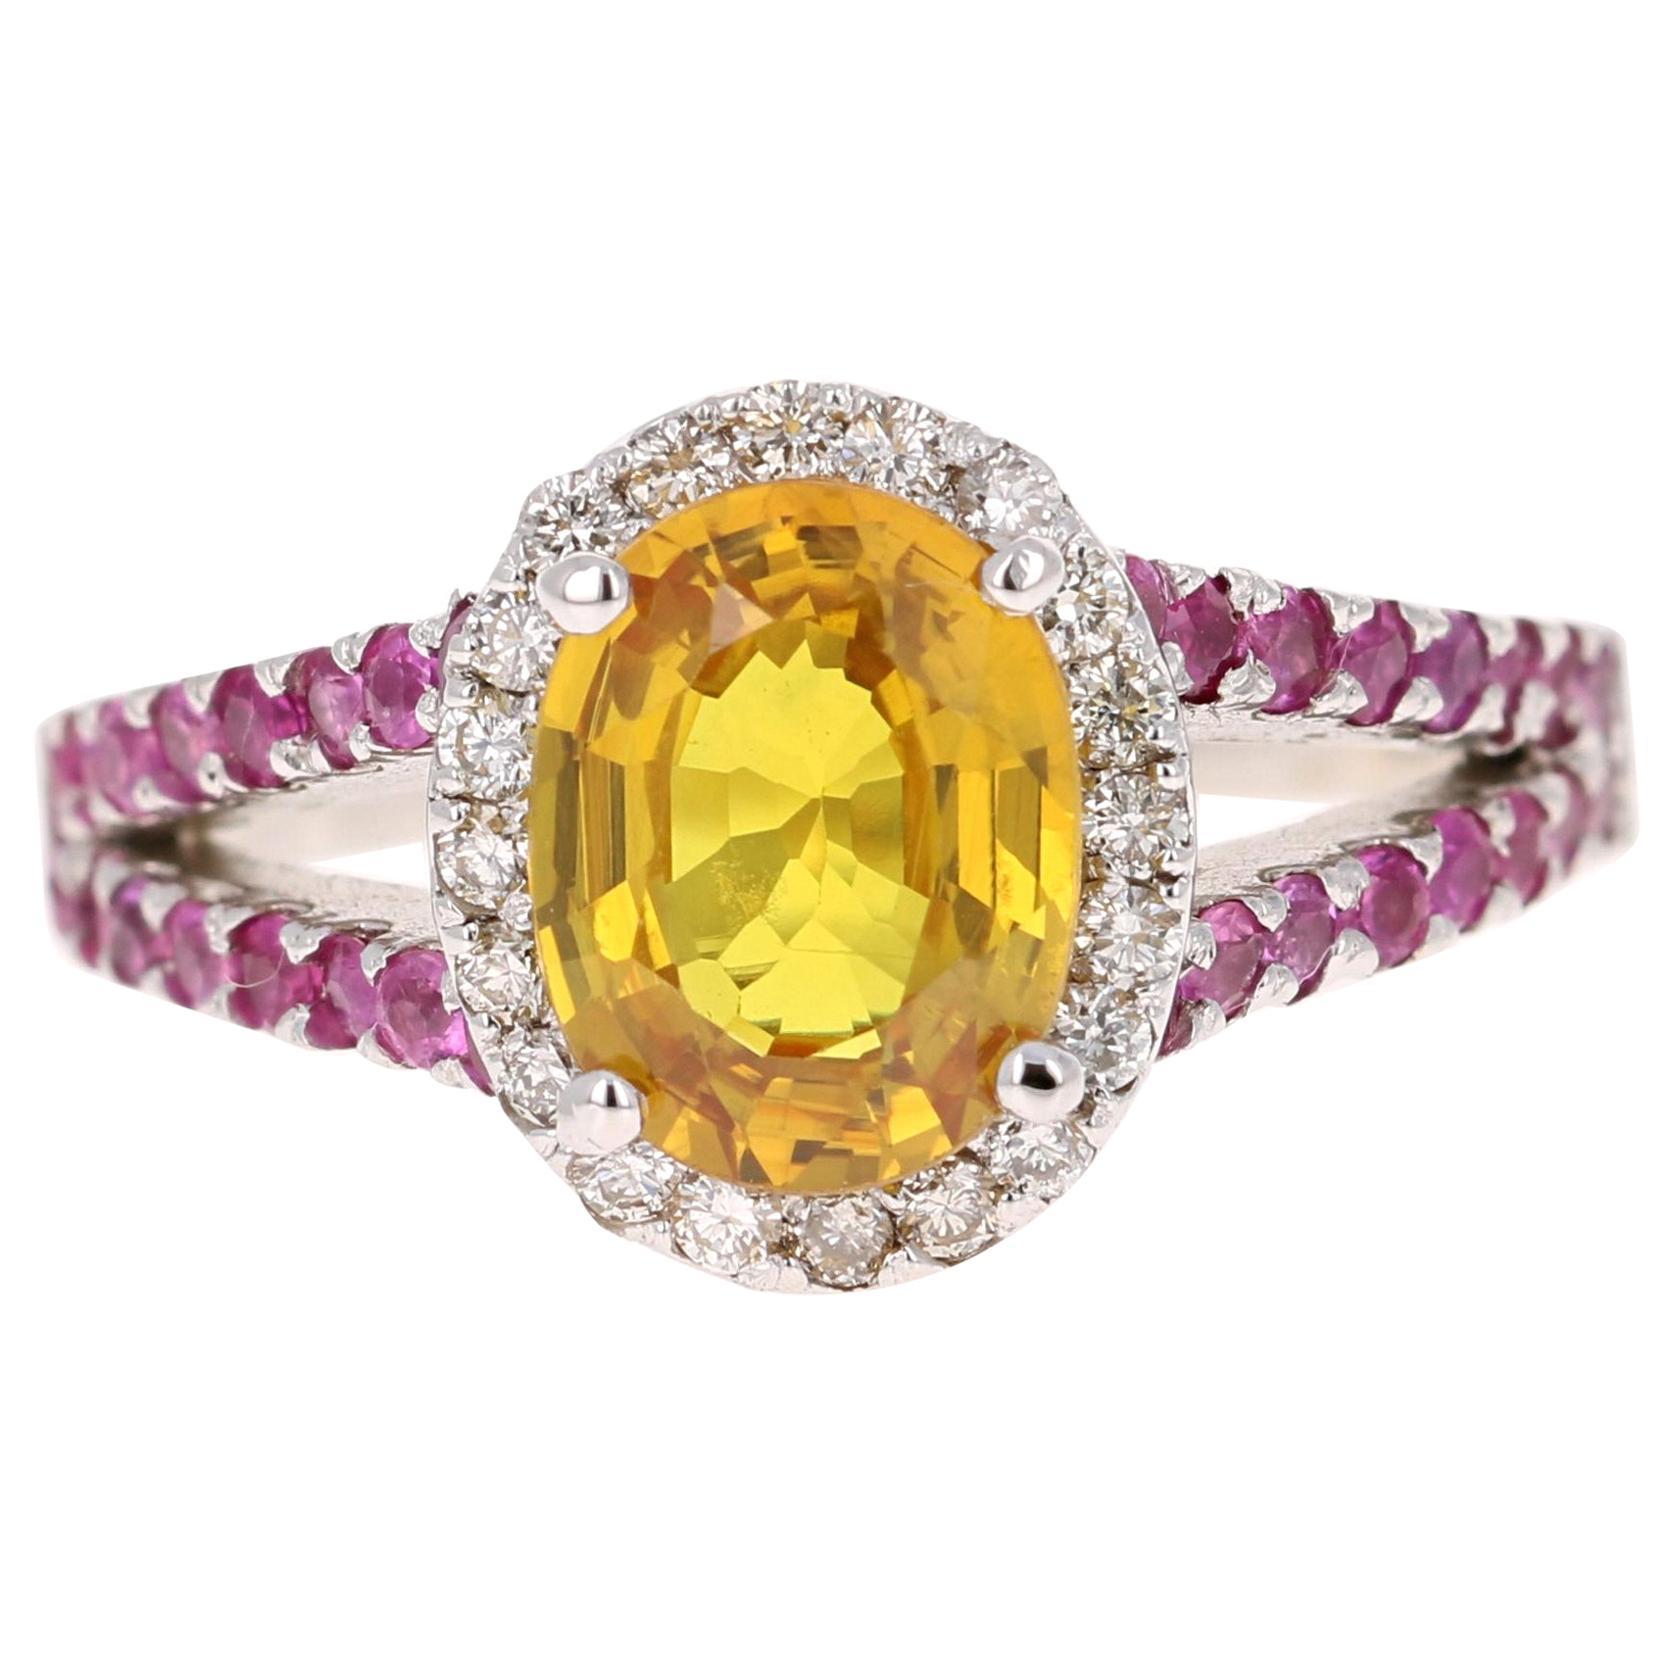 3.06 Carat Yellow Sapphire Pink Sapphire Diamond 14 Karat White Gold Ring